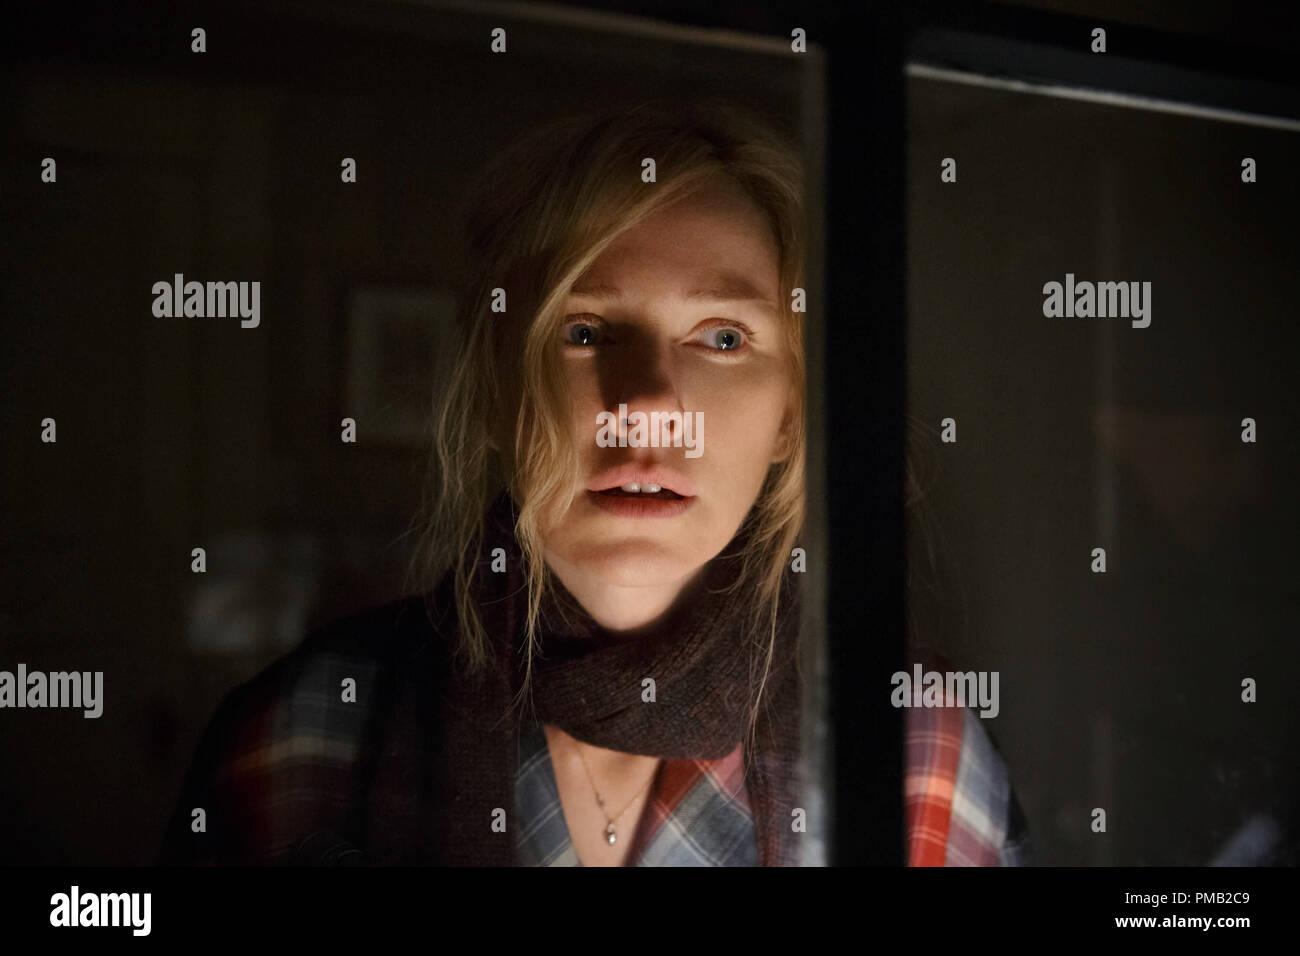 Watch Naomi Watts Sexy  Shut In - 2016 HD 720p video